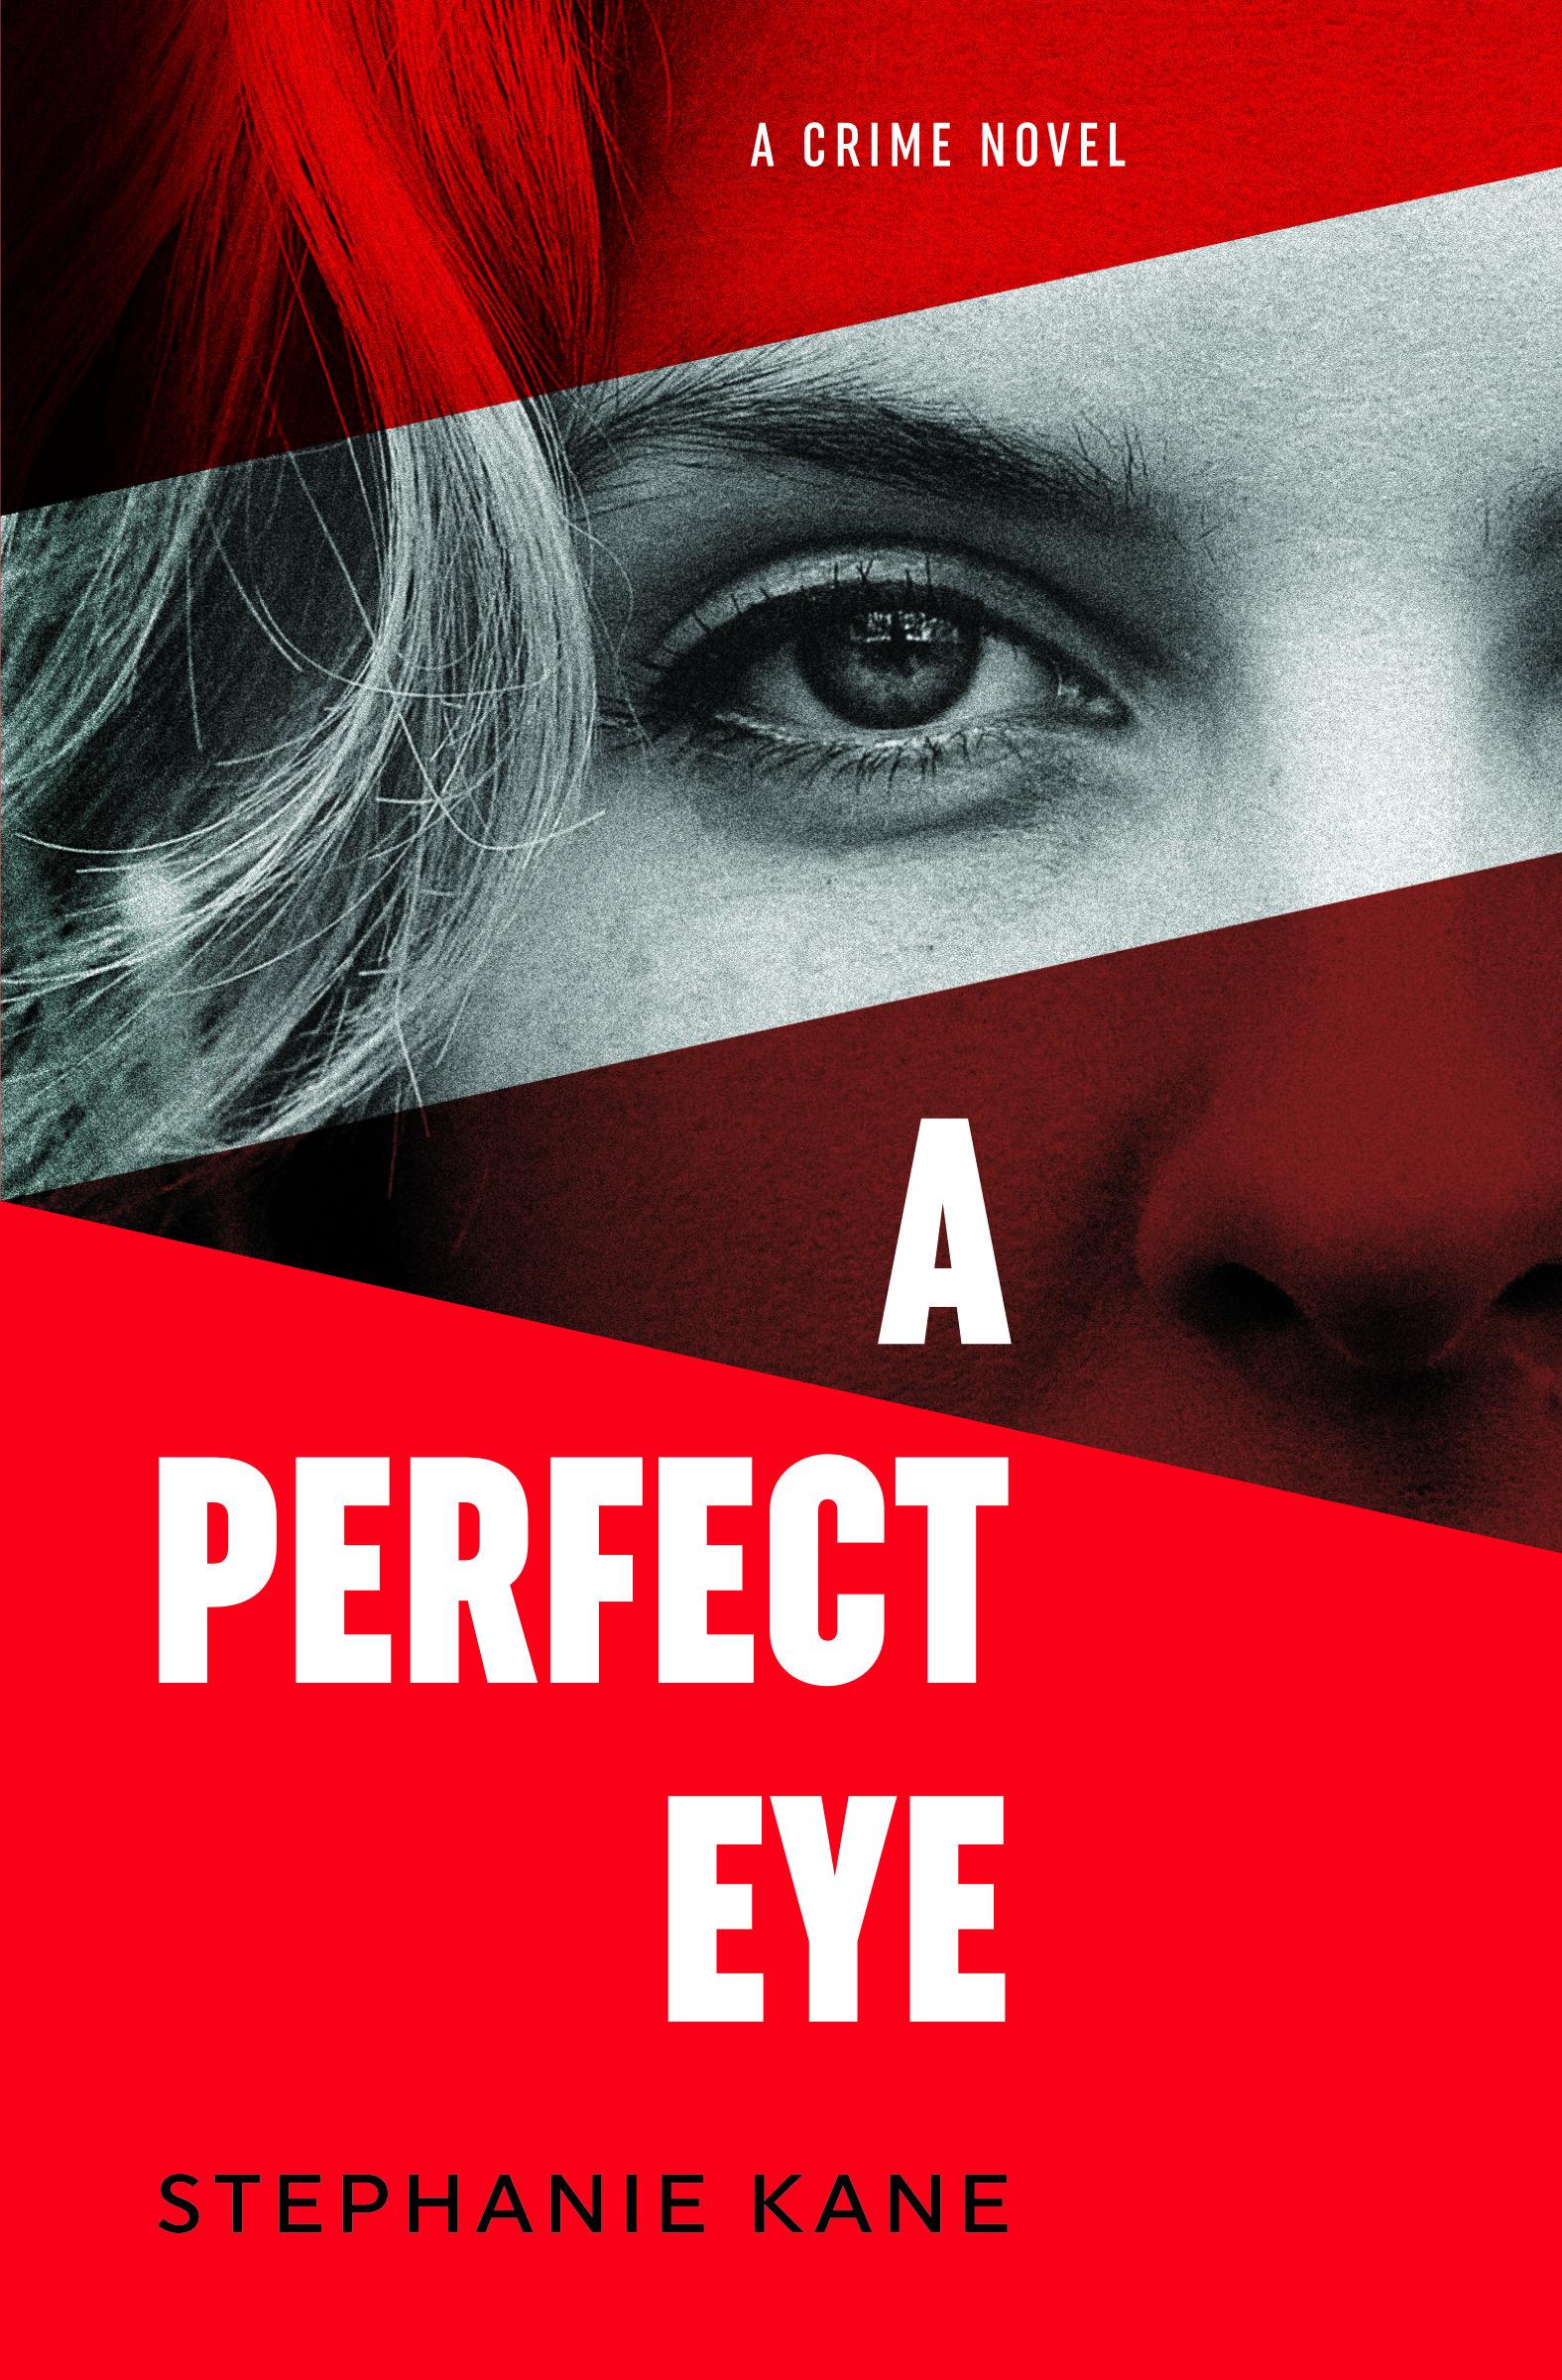 Perfect-Eye_Cover.jpg